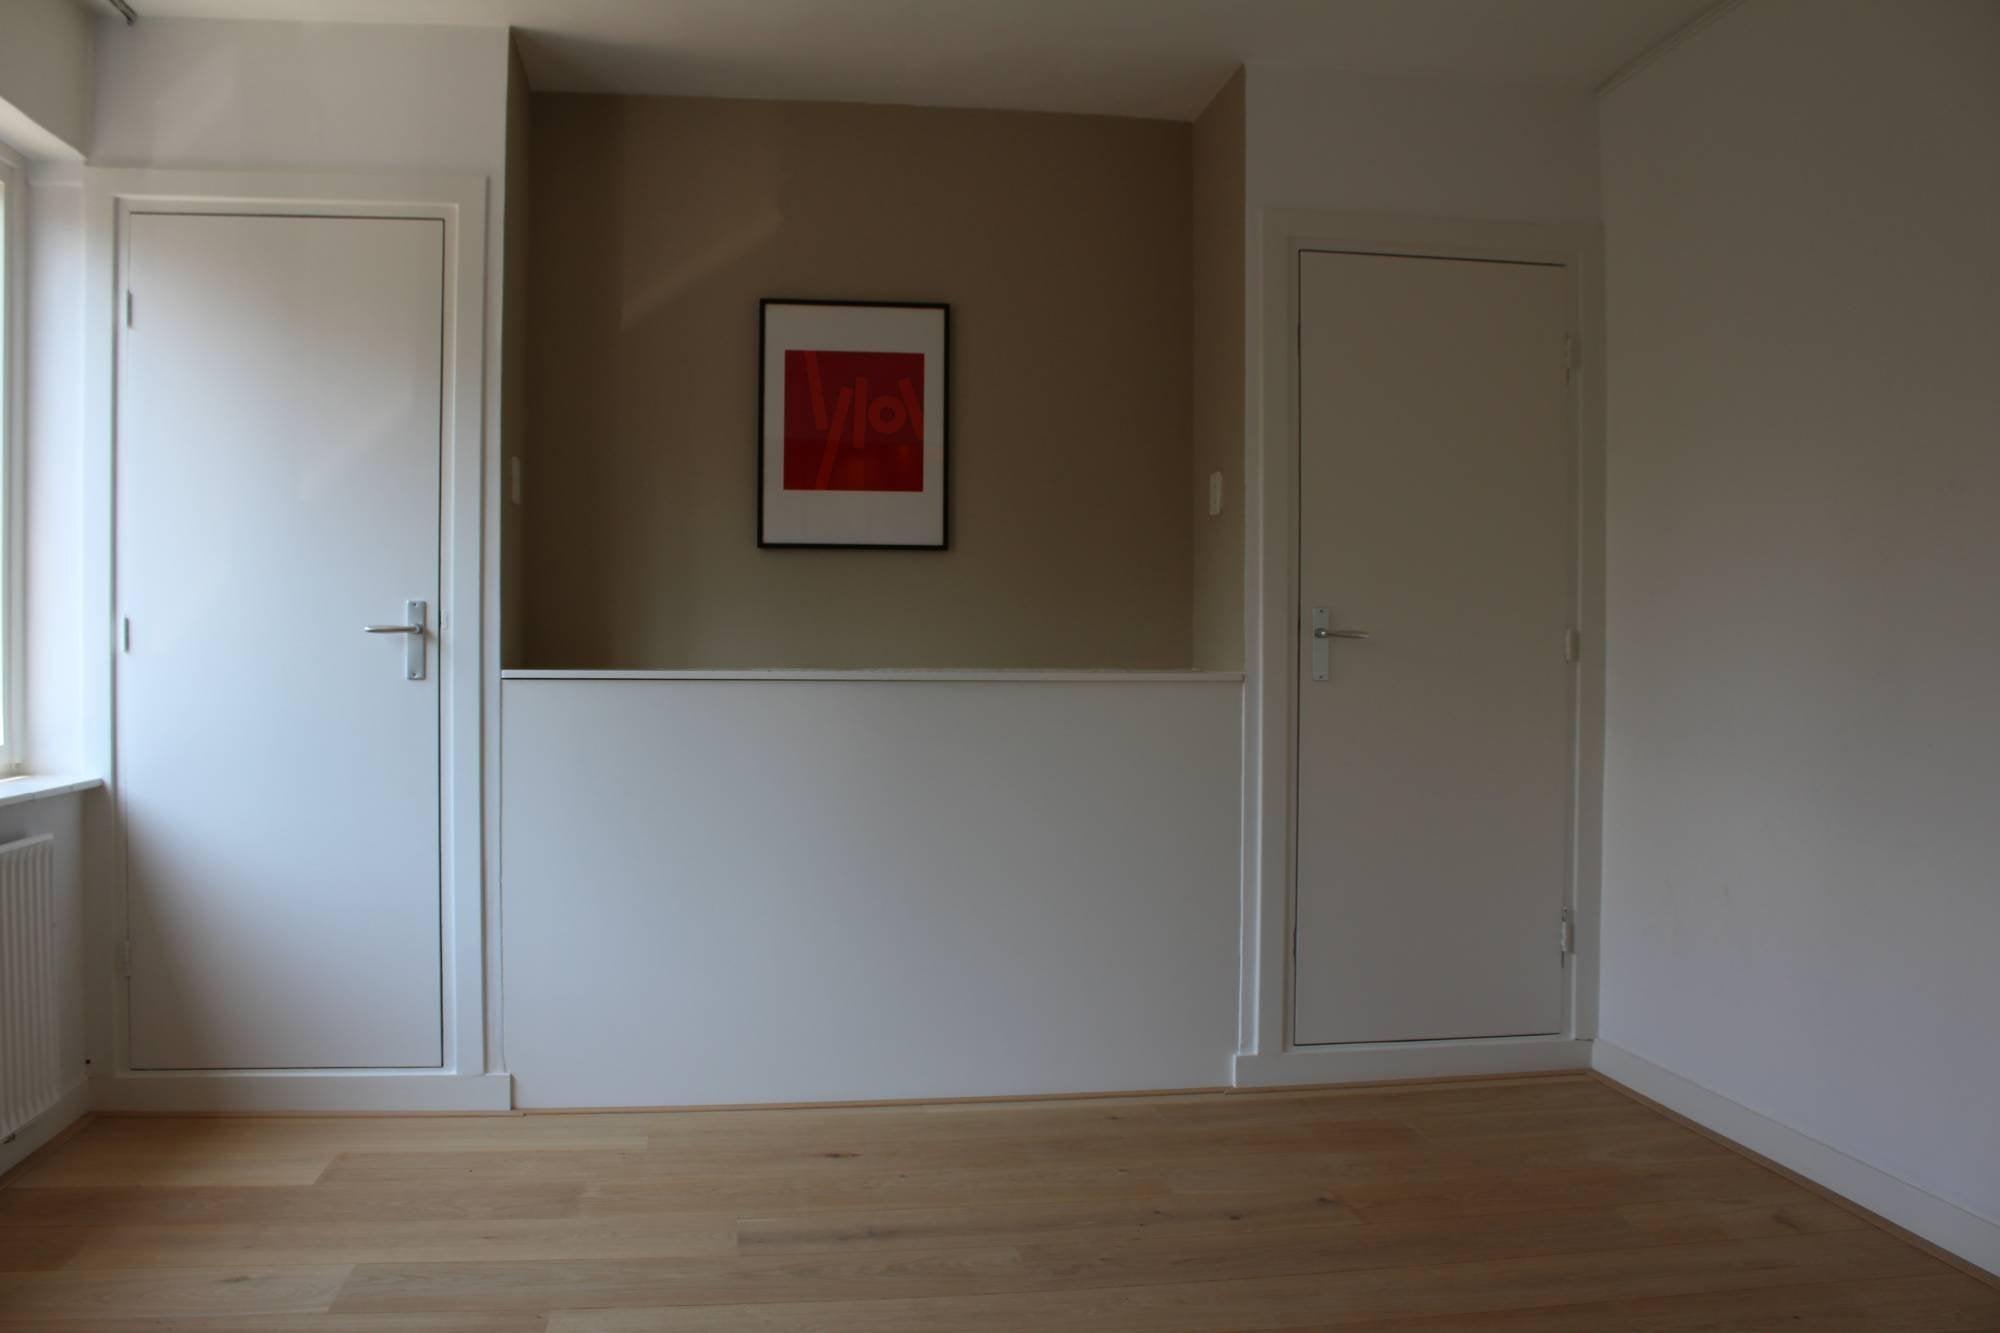 https://public.parariusoffice.nl/15/photos/huge/122977.1497532008-331.JPG